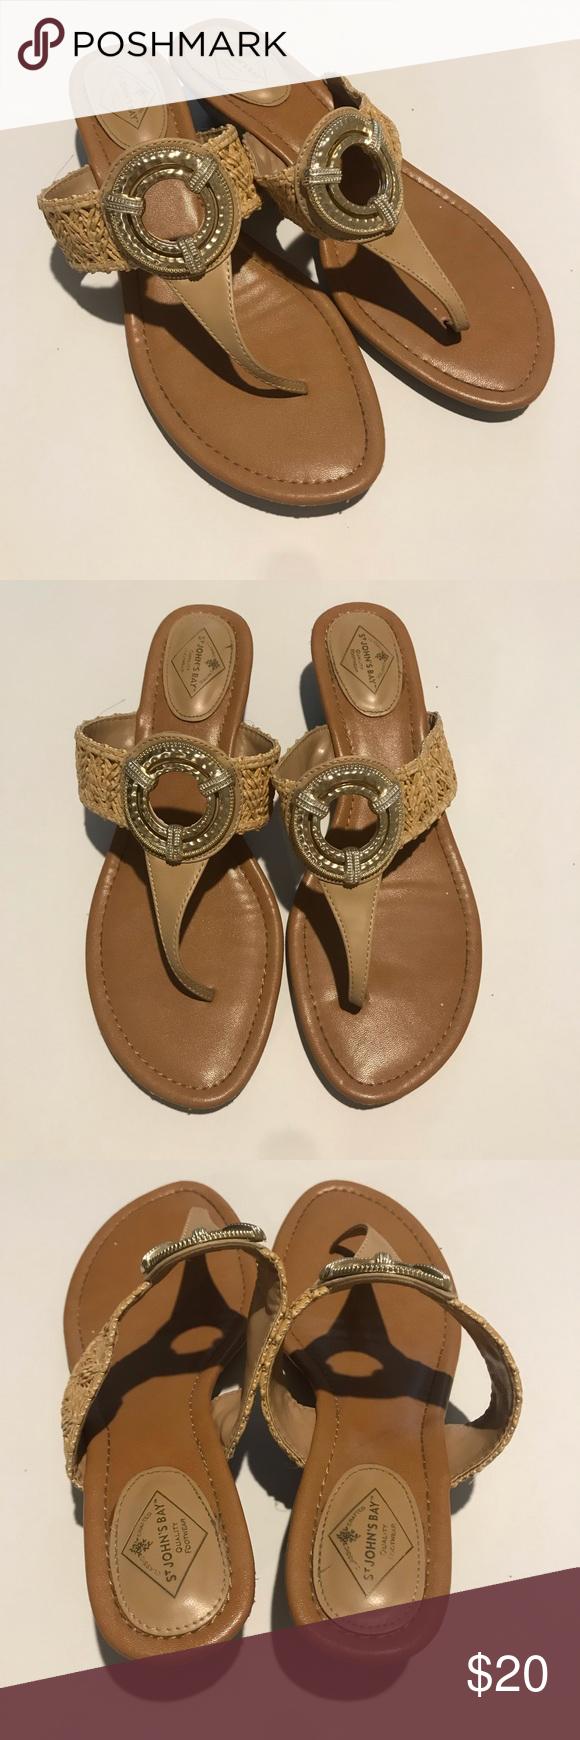 ST JOHNS BAY Key Hole Wedge Sandals